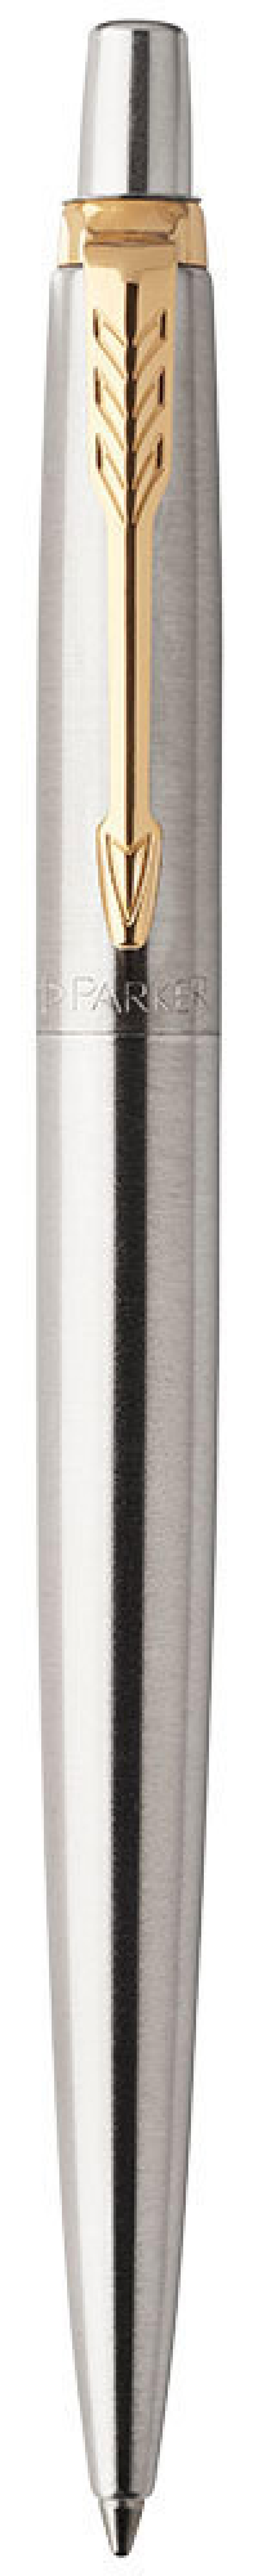 Шариковая ручка автоматическая Parker Jotter Core K63 Stainless Steel GT синий M 1953182 шариковая ручка parker jotter цвет красный 1005109